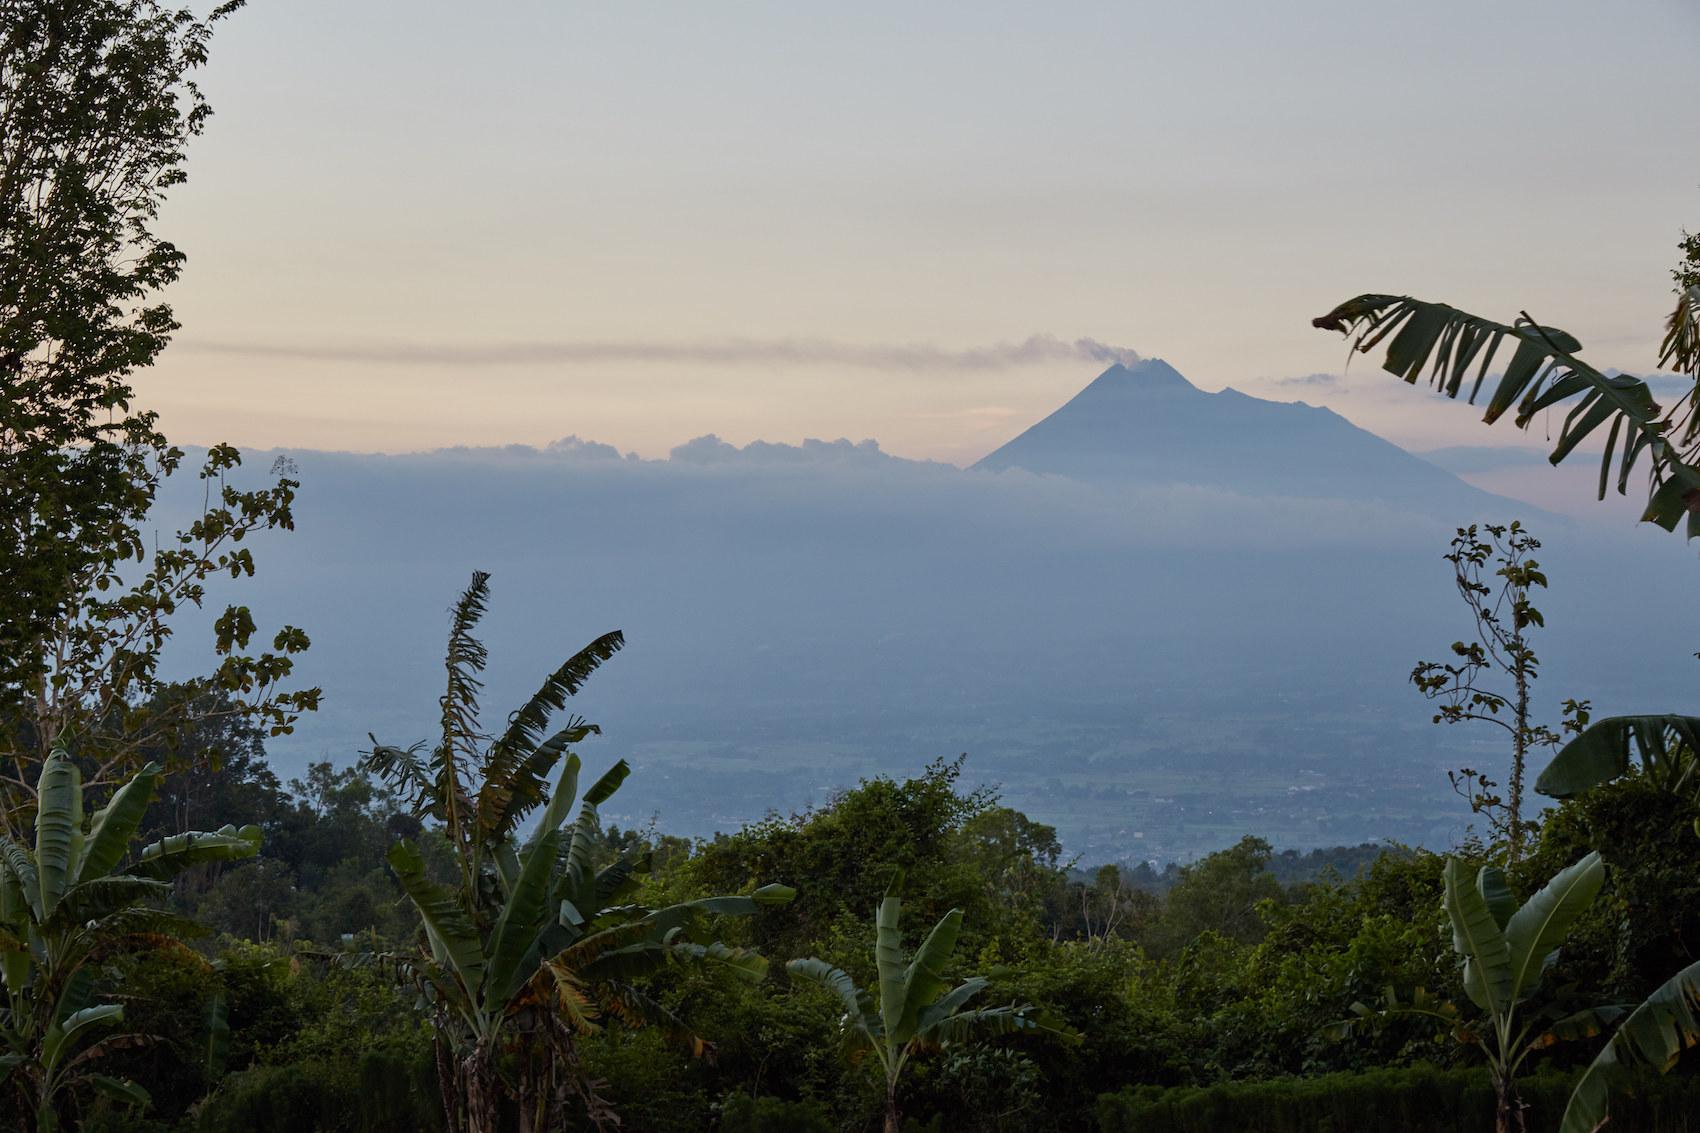 Mt. Merapi, Java, Indonesia